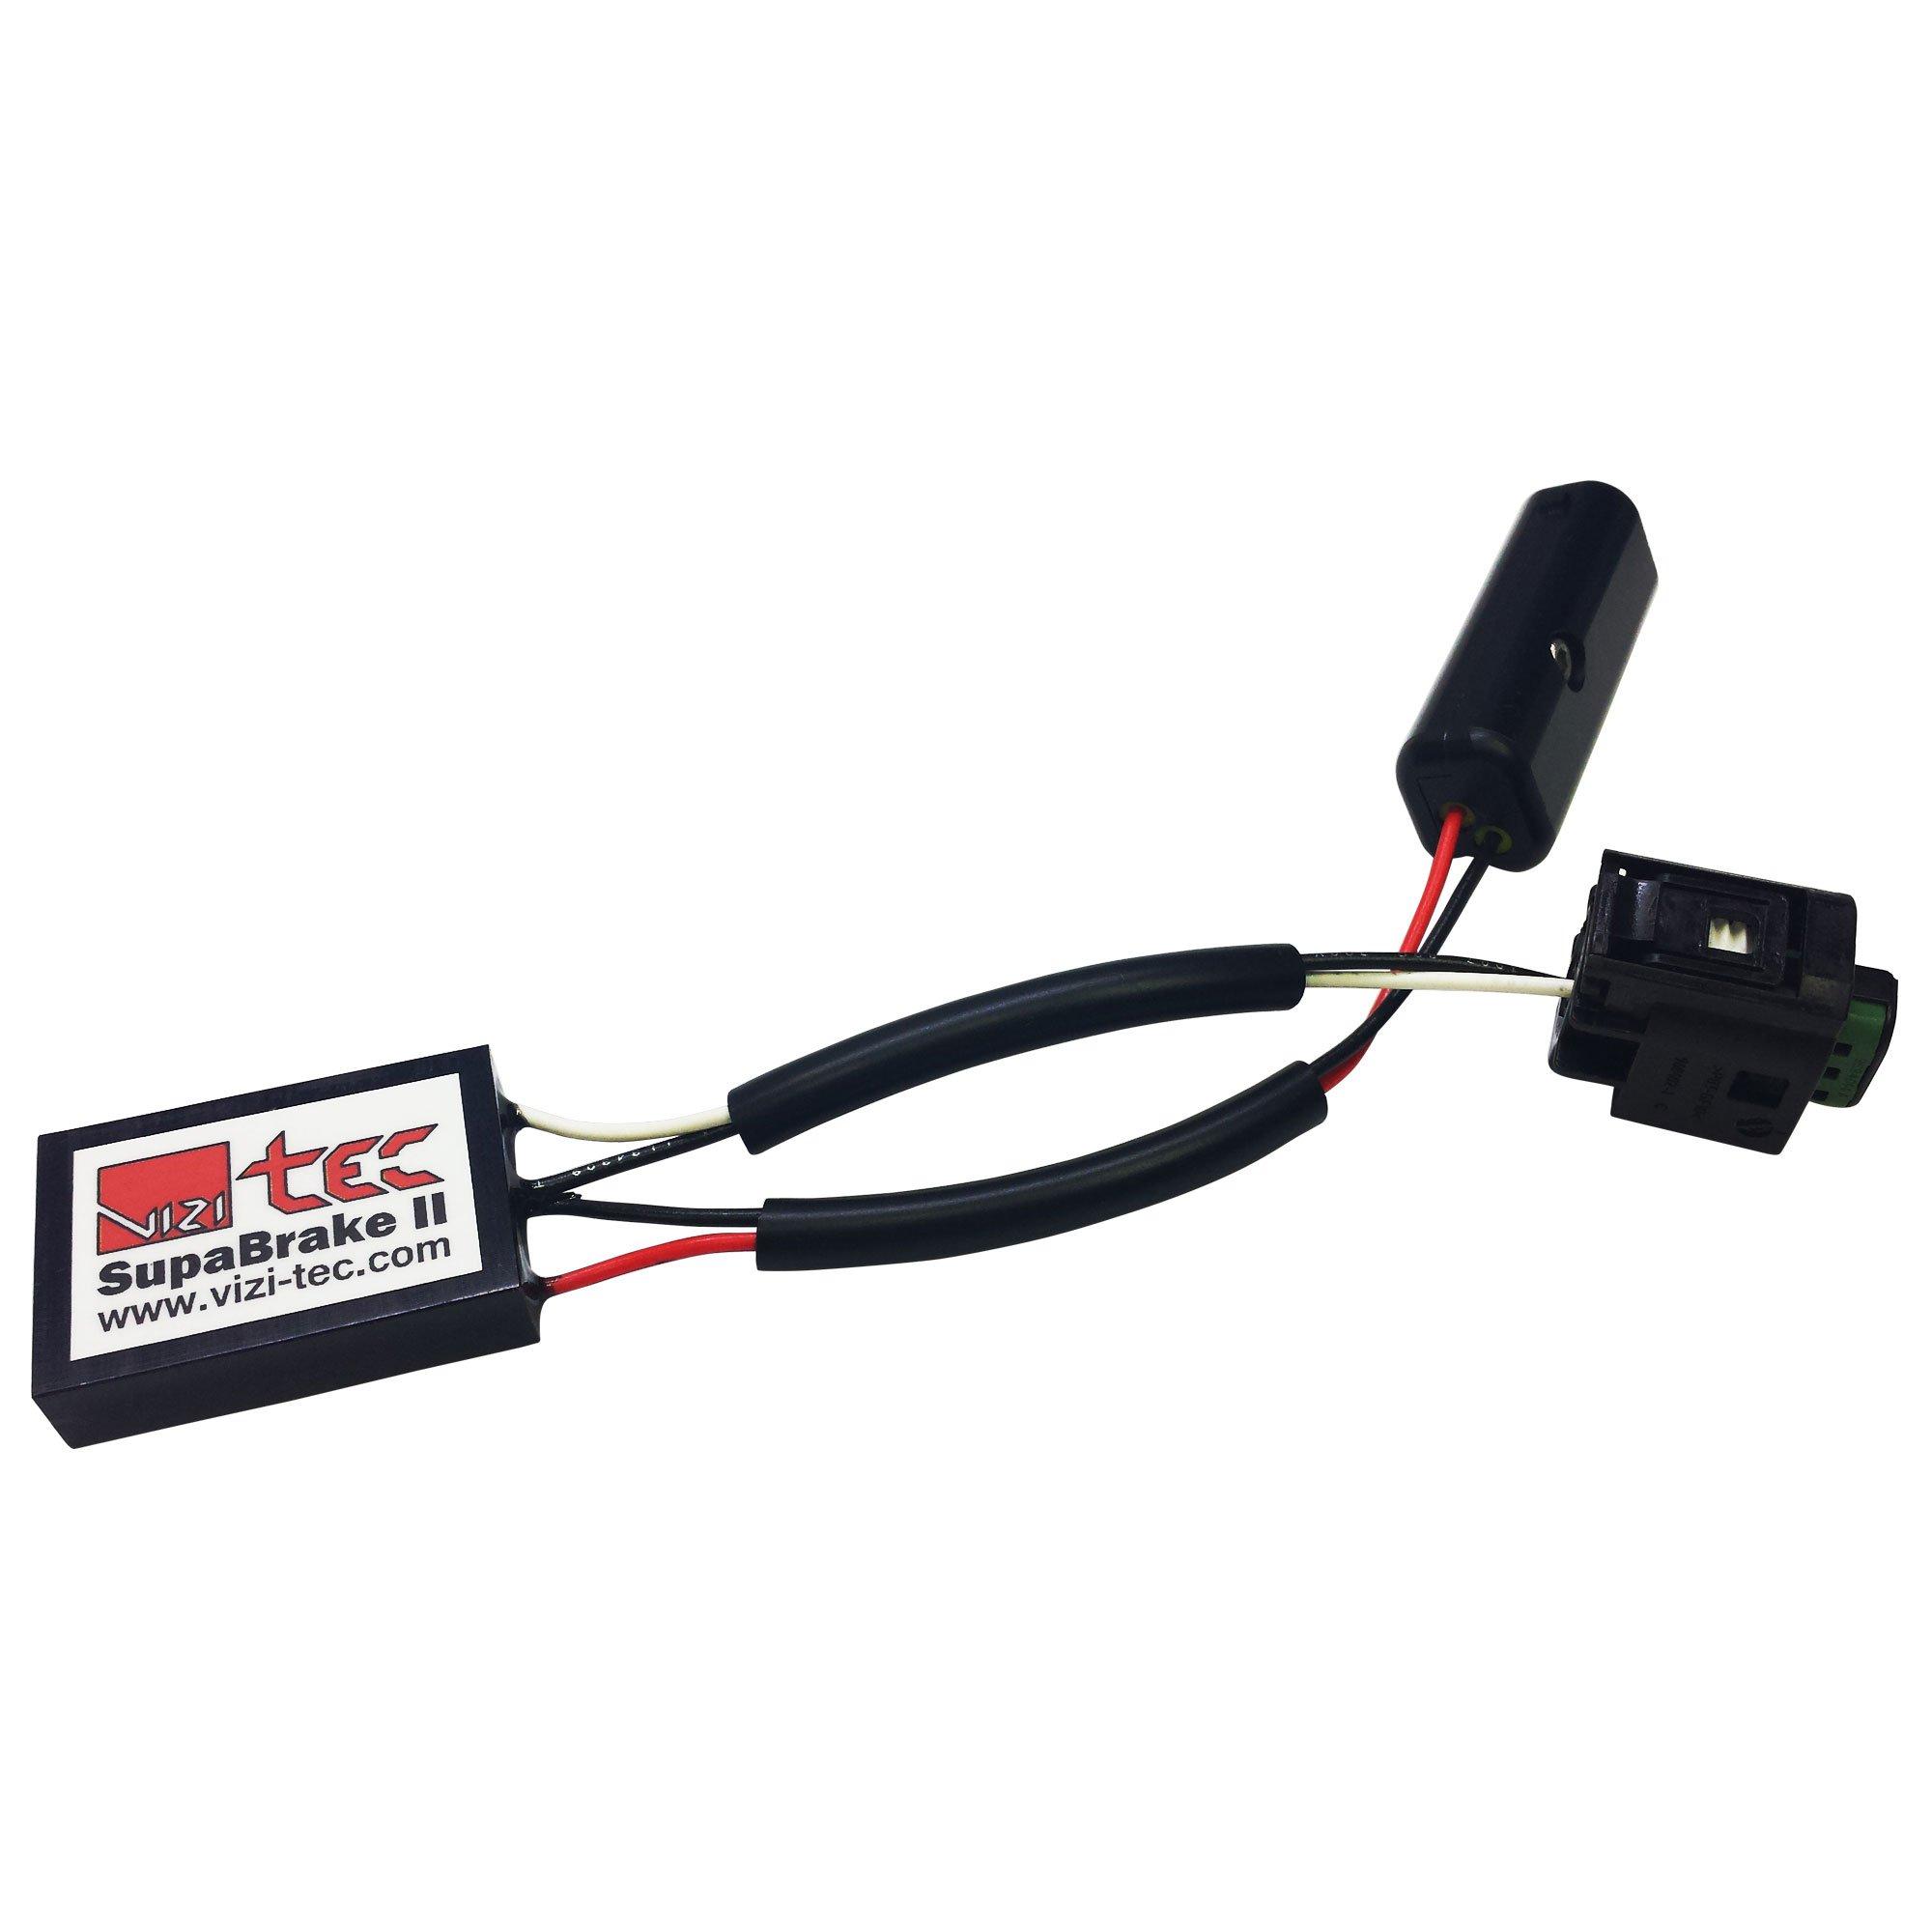 Vizi-Tec SupaBrake-II Brake Light Modulator - BMW HP2 Sport by Vizi-Tec